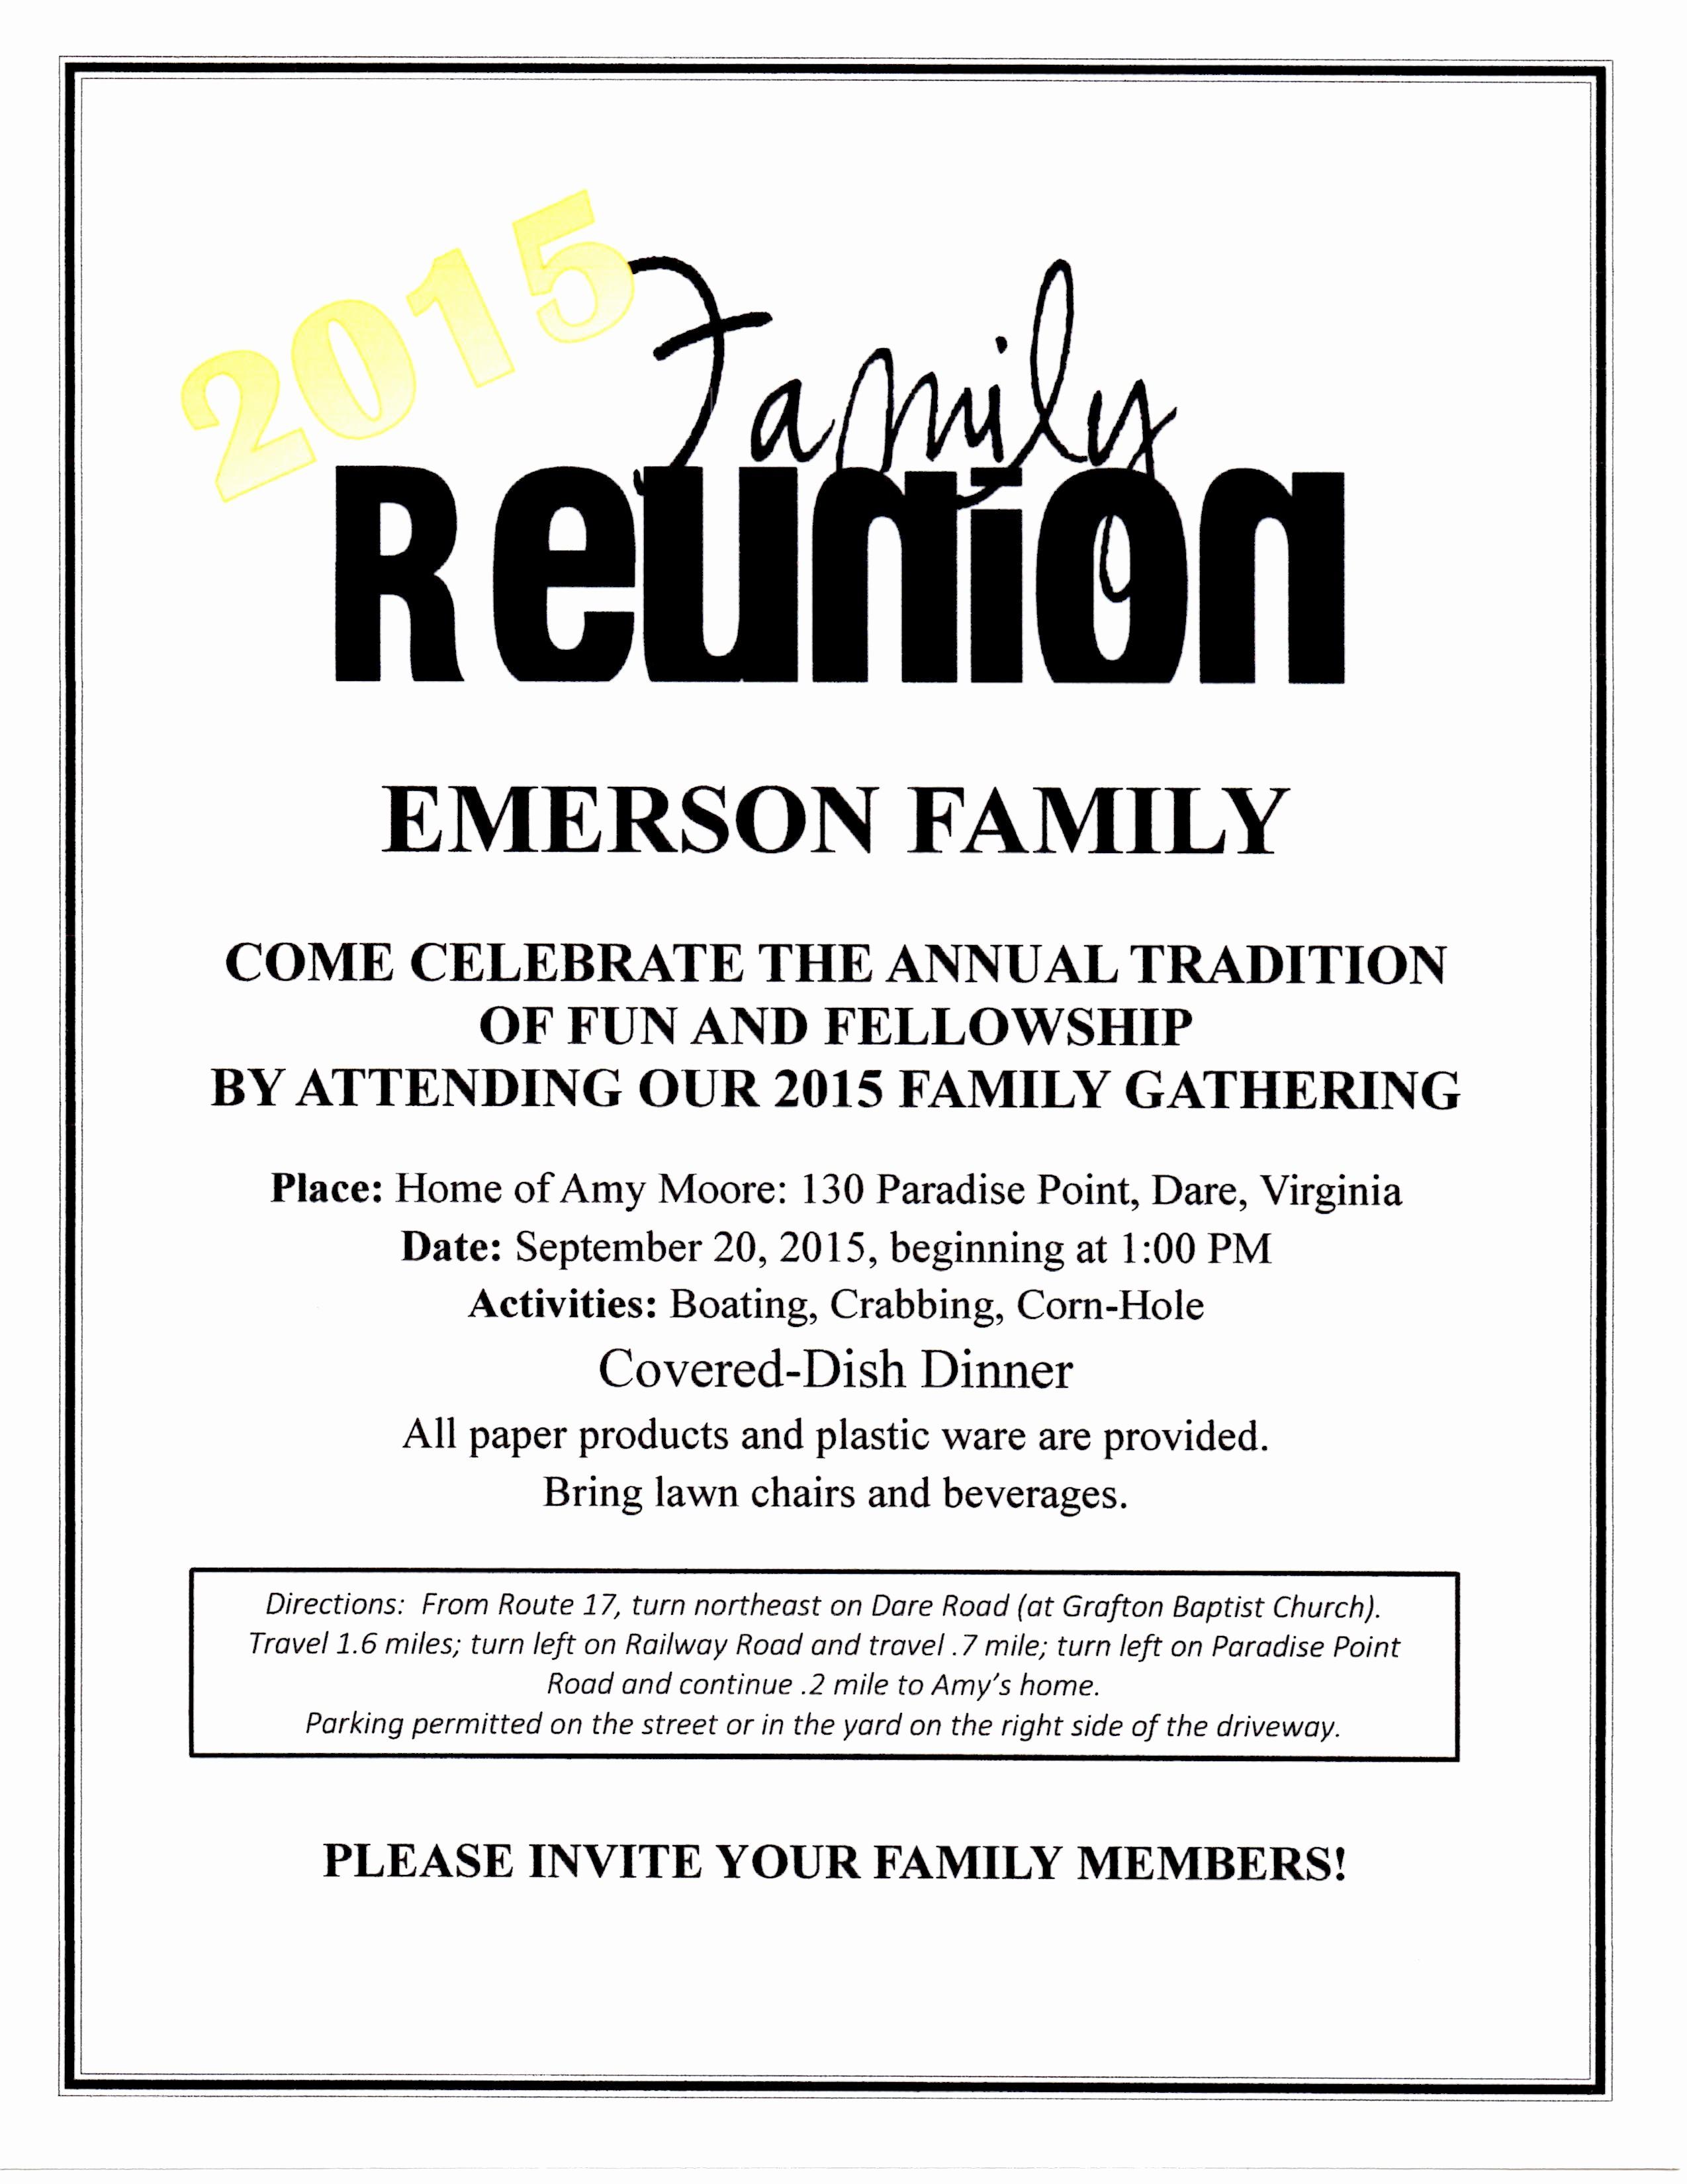 Free Family Reunion Flyer Template Fresh 2015 Family Reunion